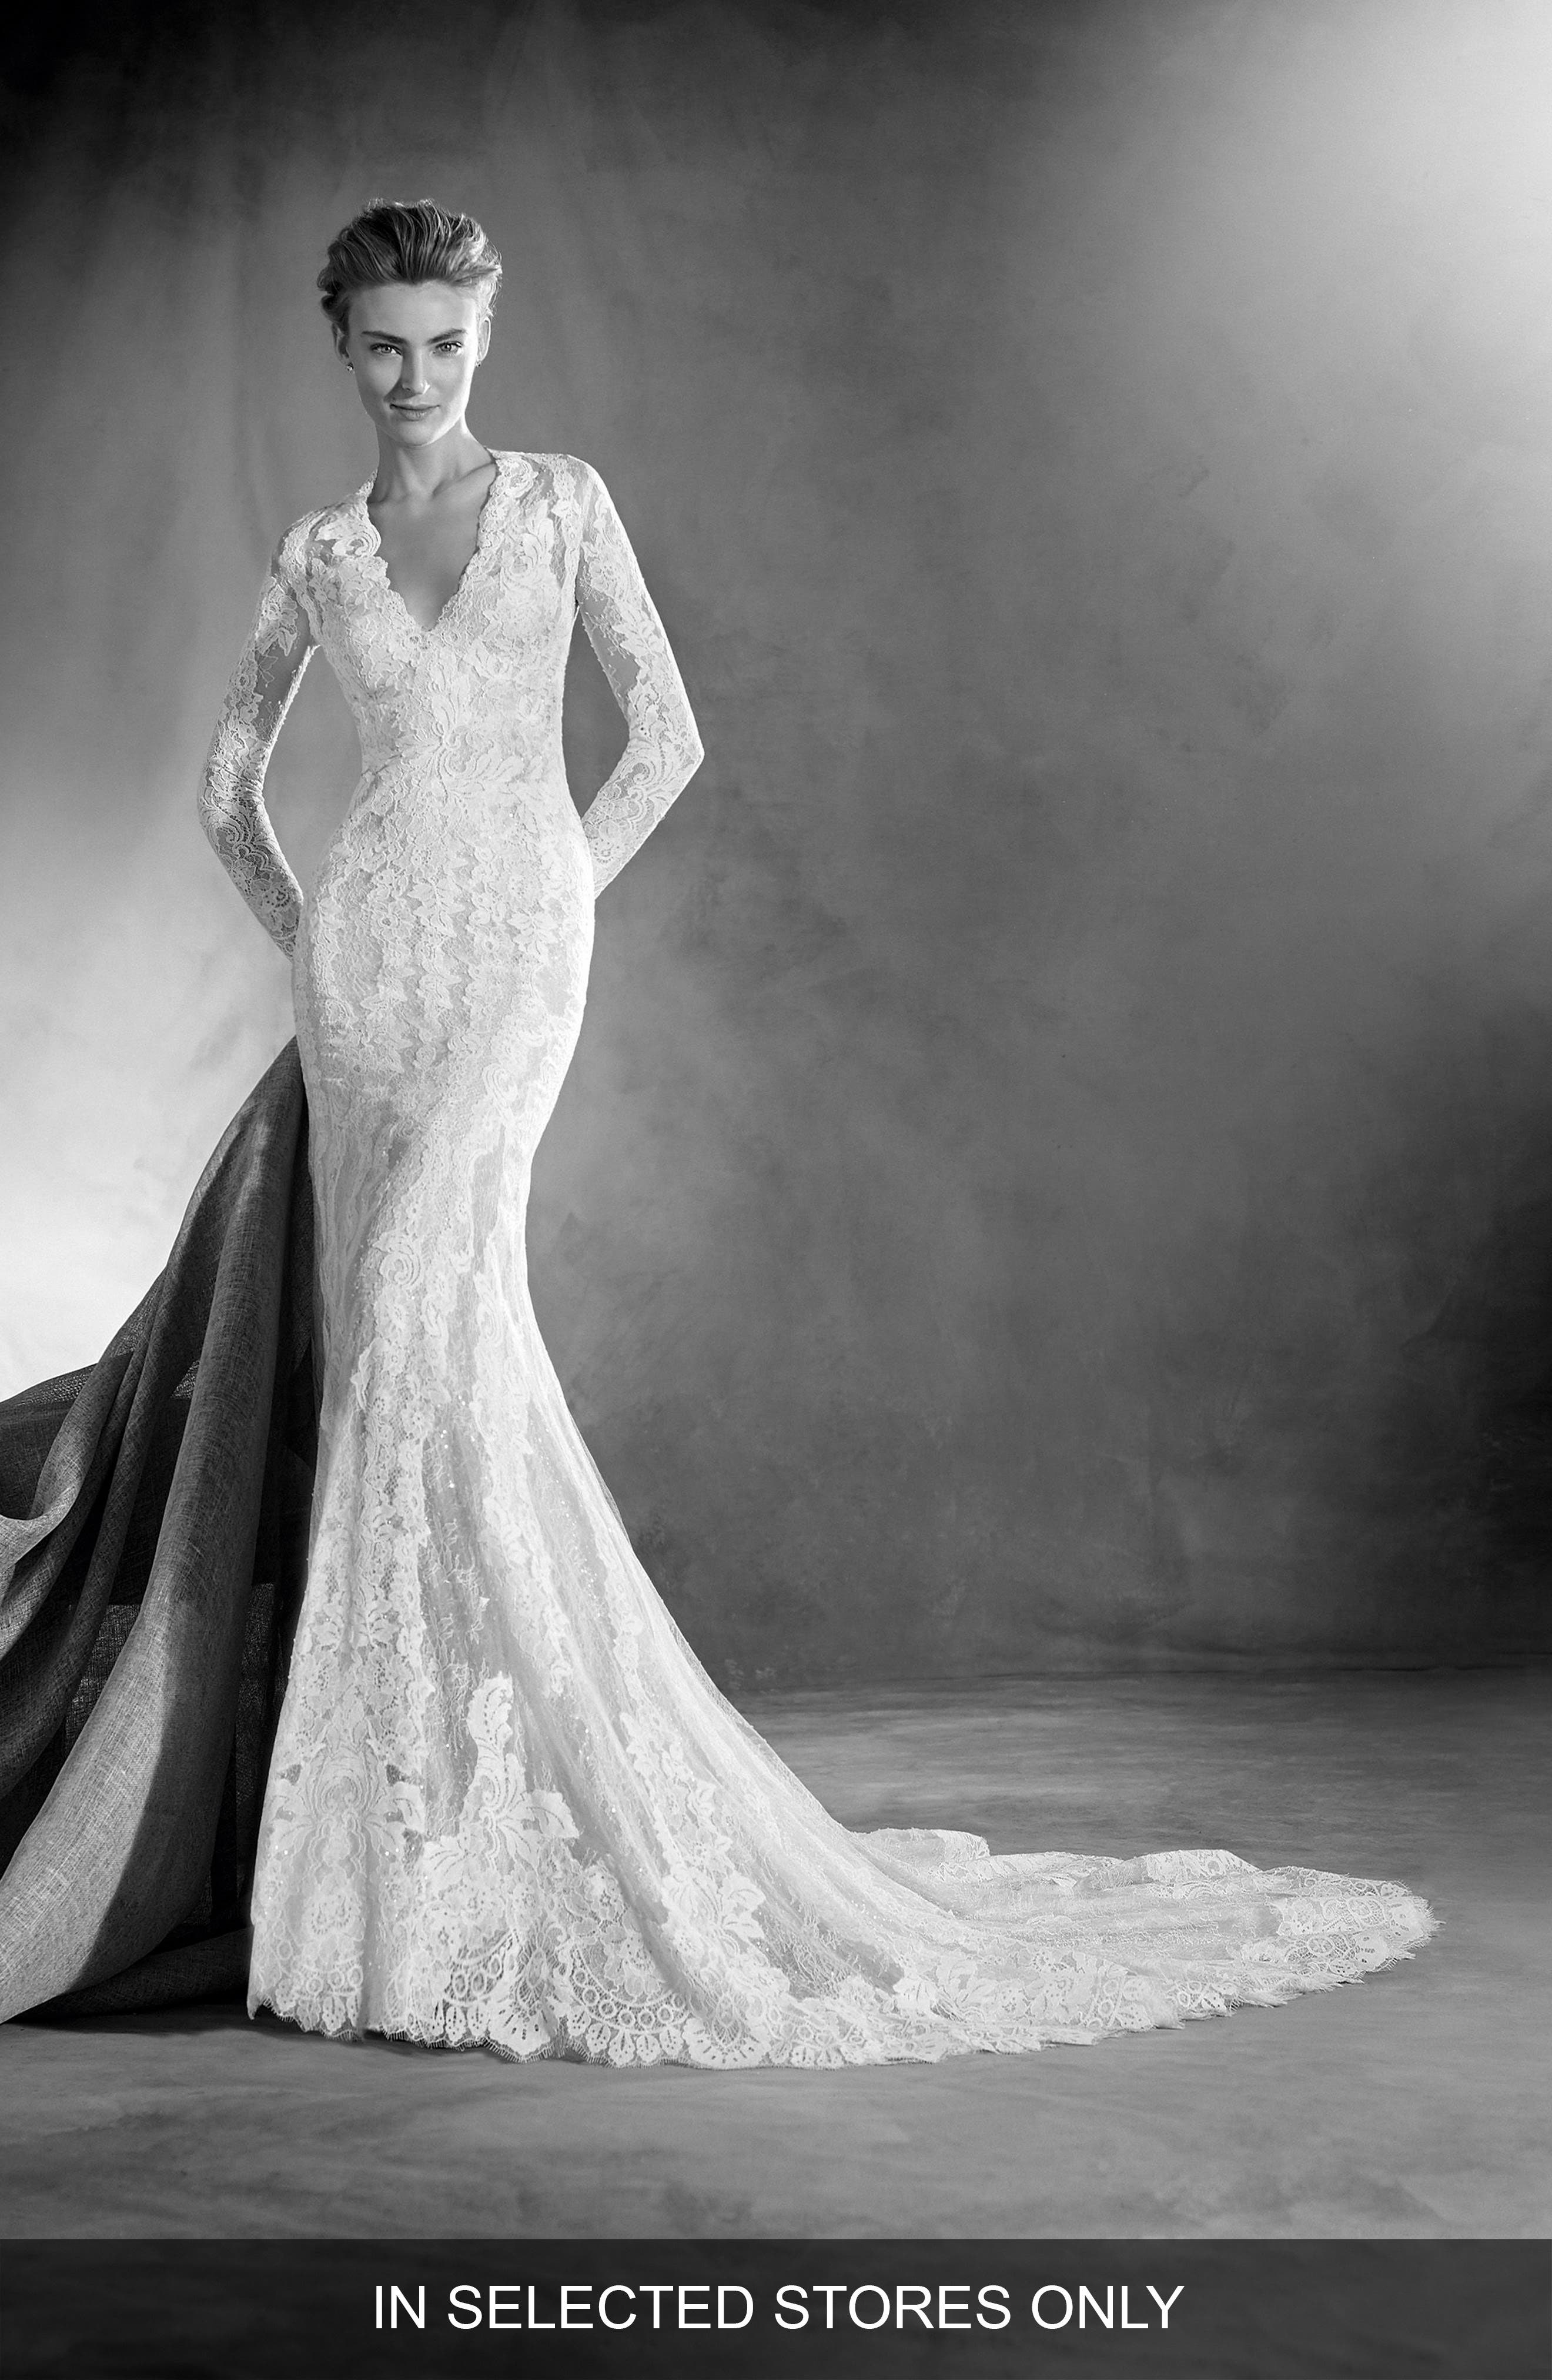 Alternate Image 1 Selected - Atelier Pronovias Elva Lace Mermaid Gown